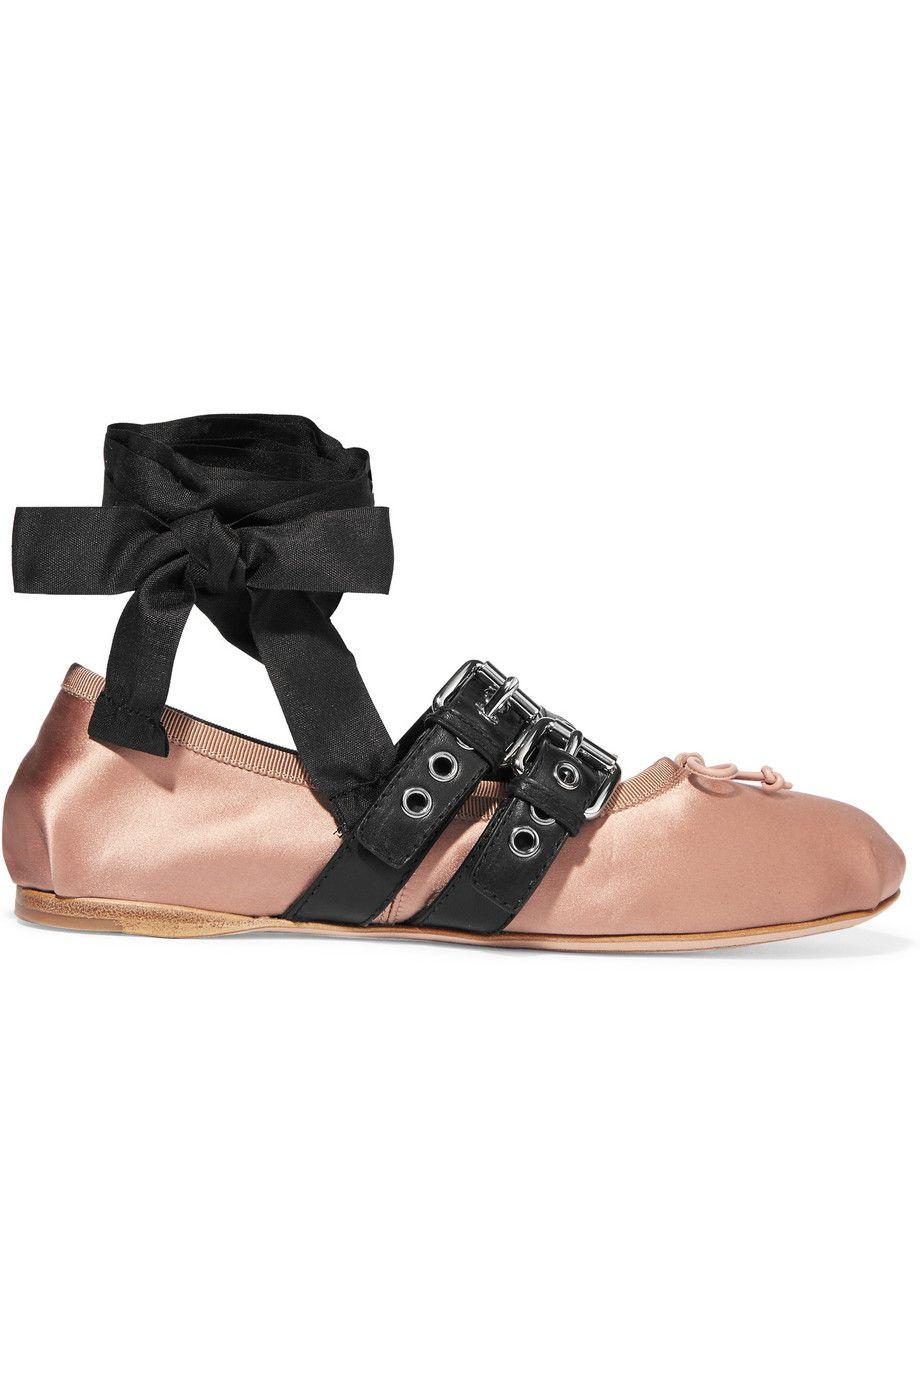 Miu Miu | Buckled leather and satin ballet flats | NET-A-PORTER.COM